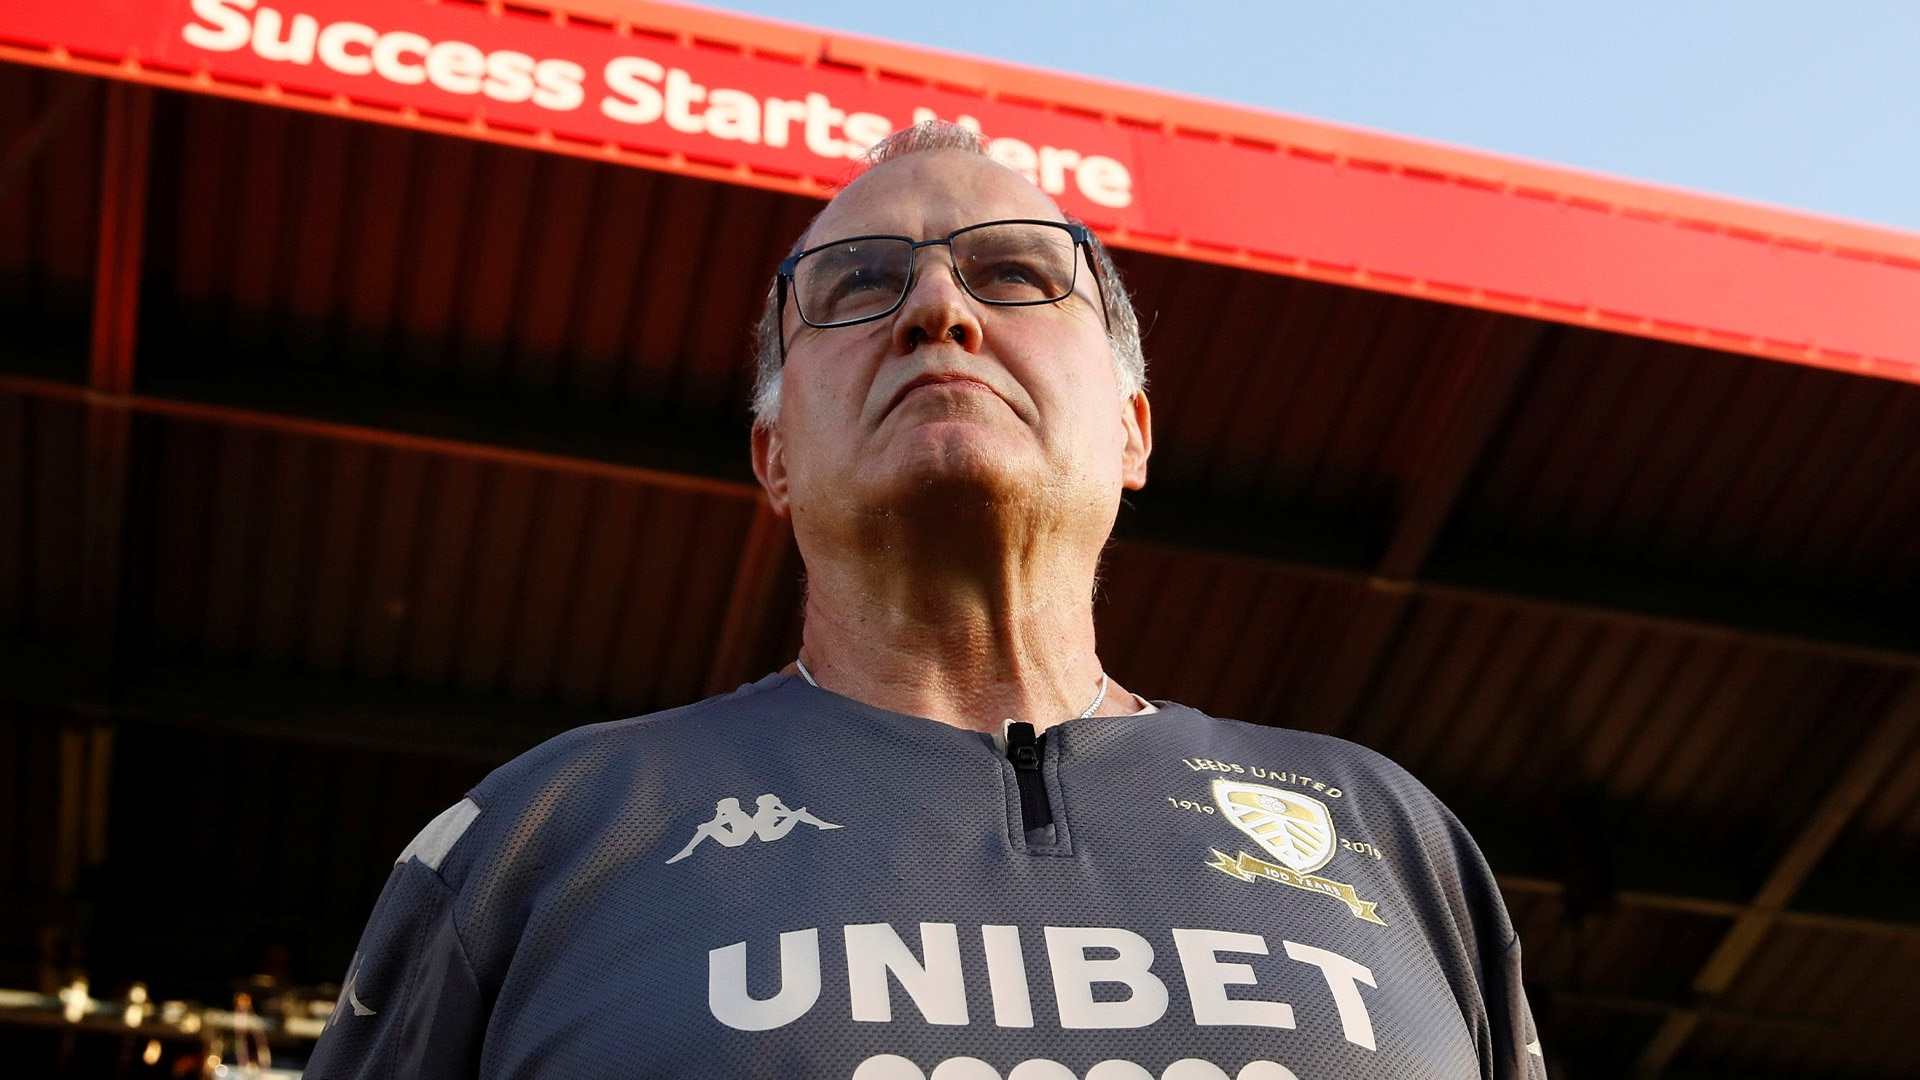 La impactante cifra que Bielsa le hará ganar al Leeds United si logra el ascenso a la Premier League - Infobae